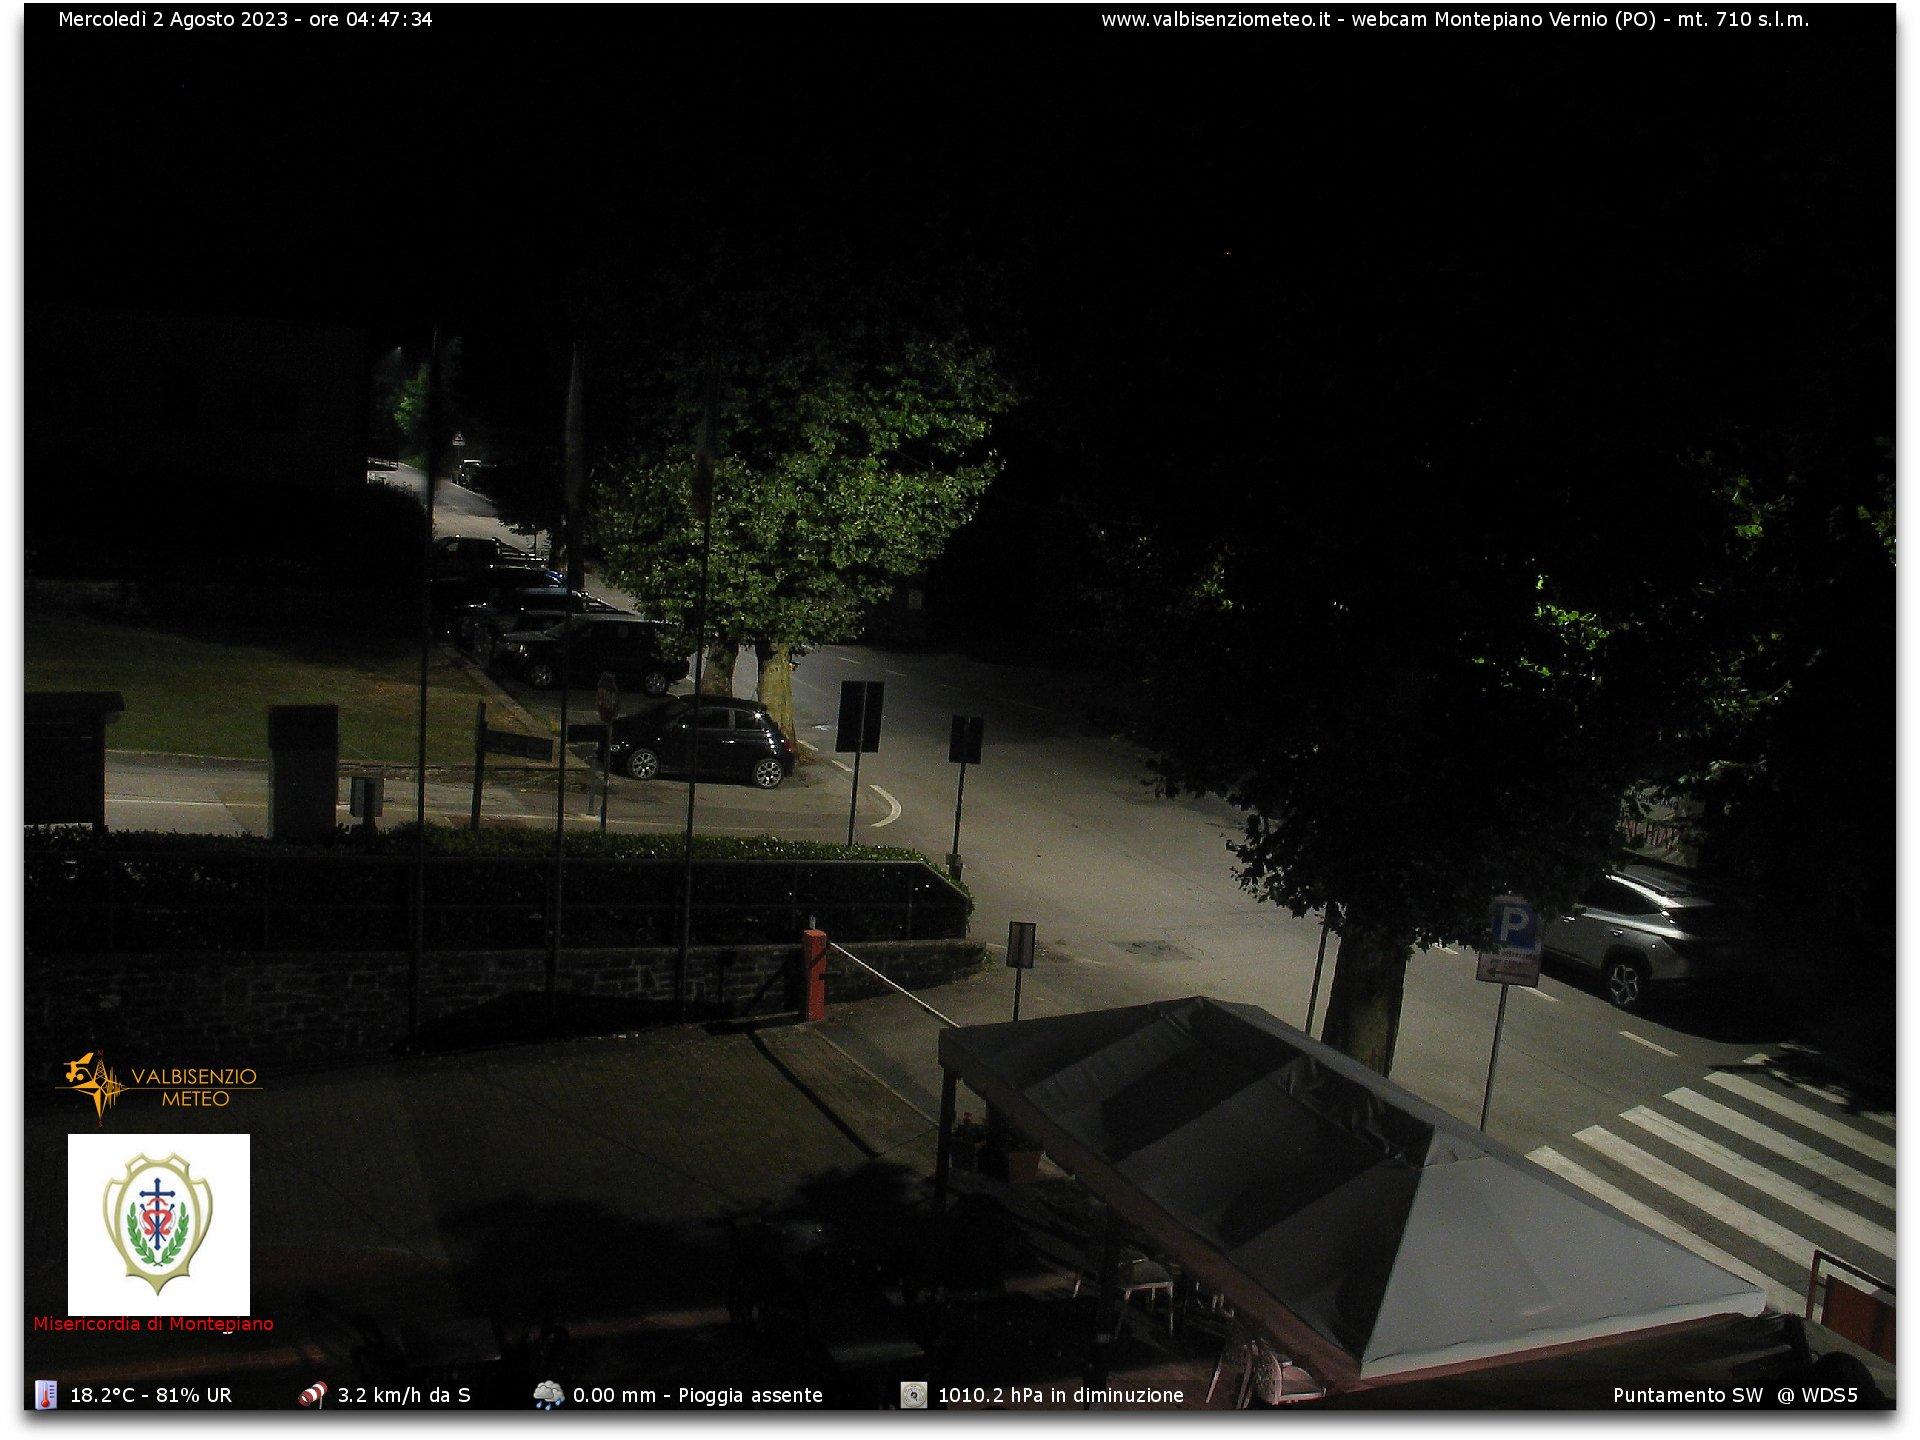 Webcam VALBISENZIOMETEO